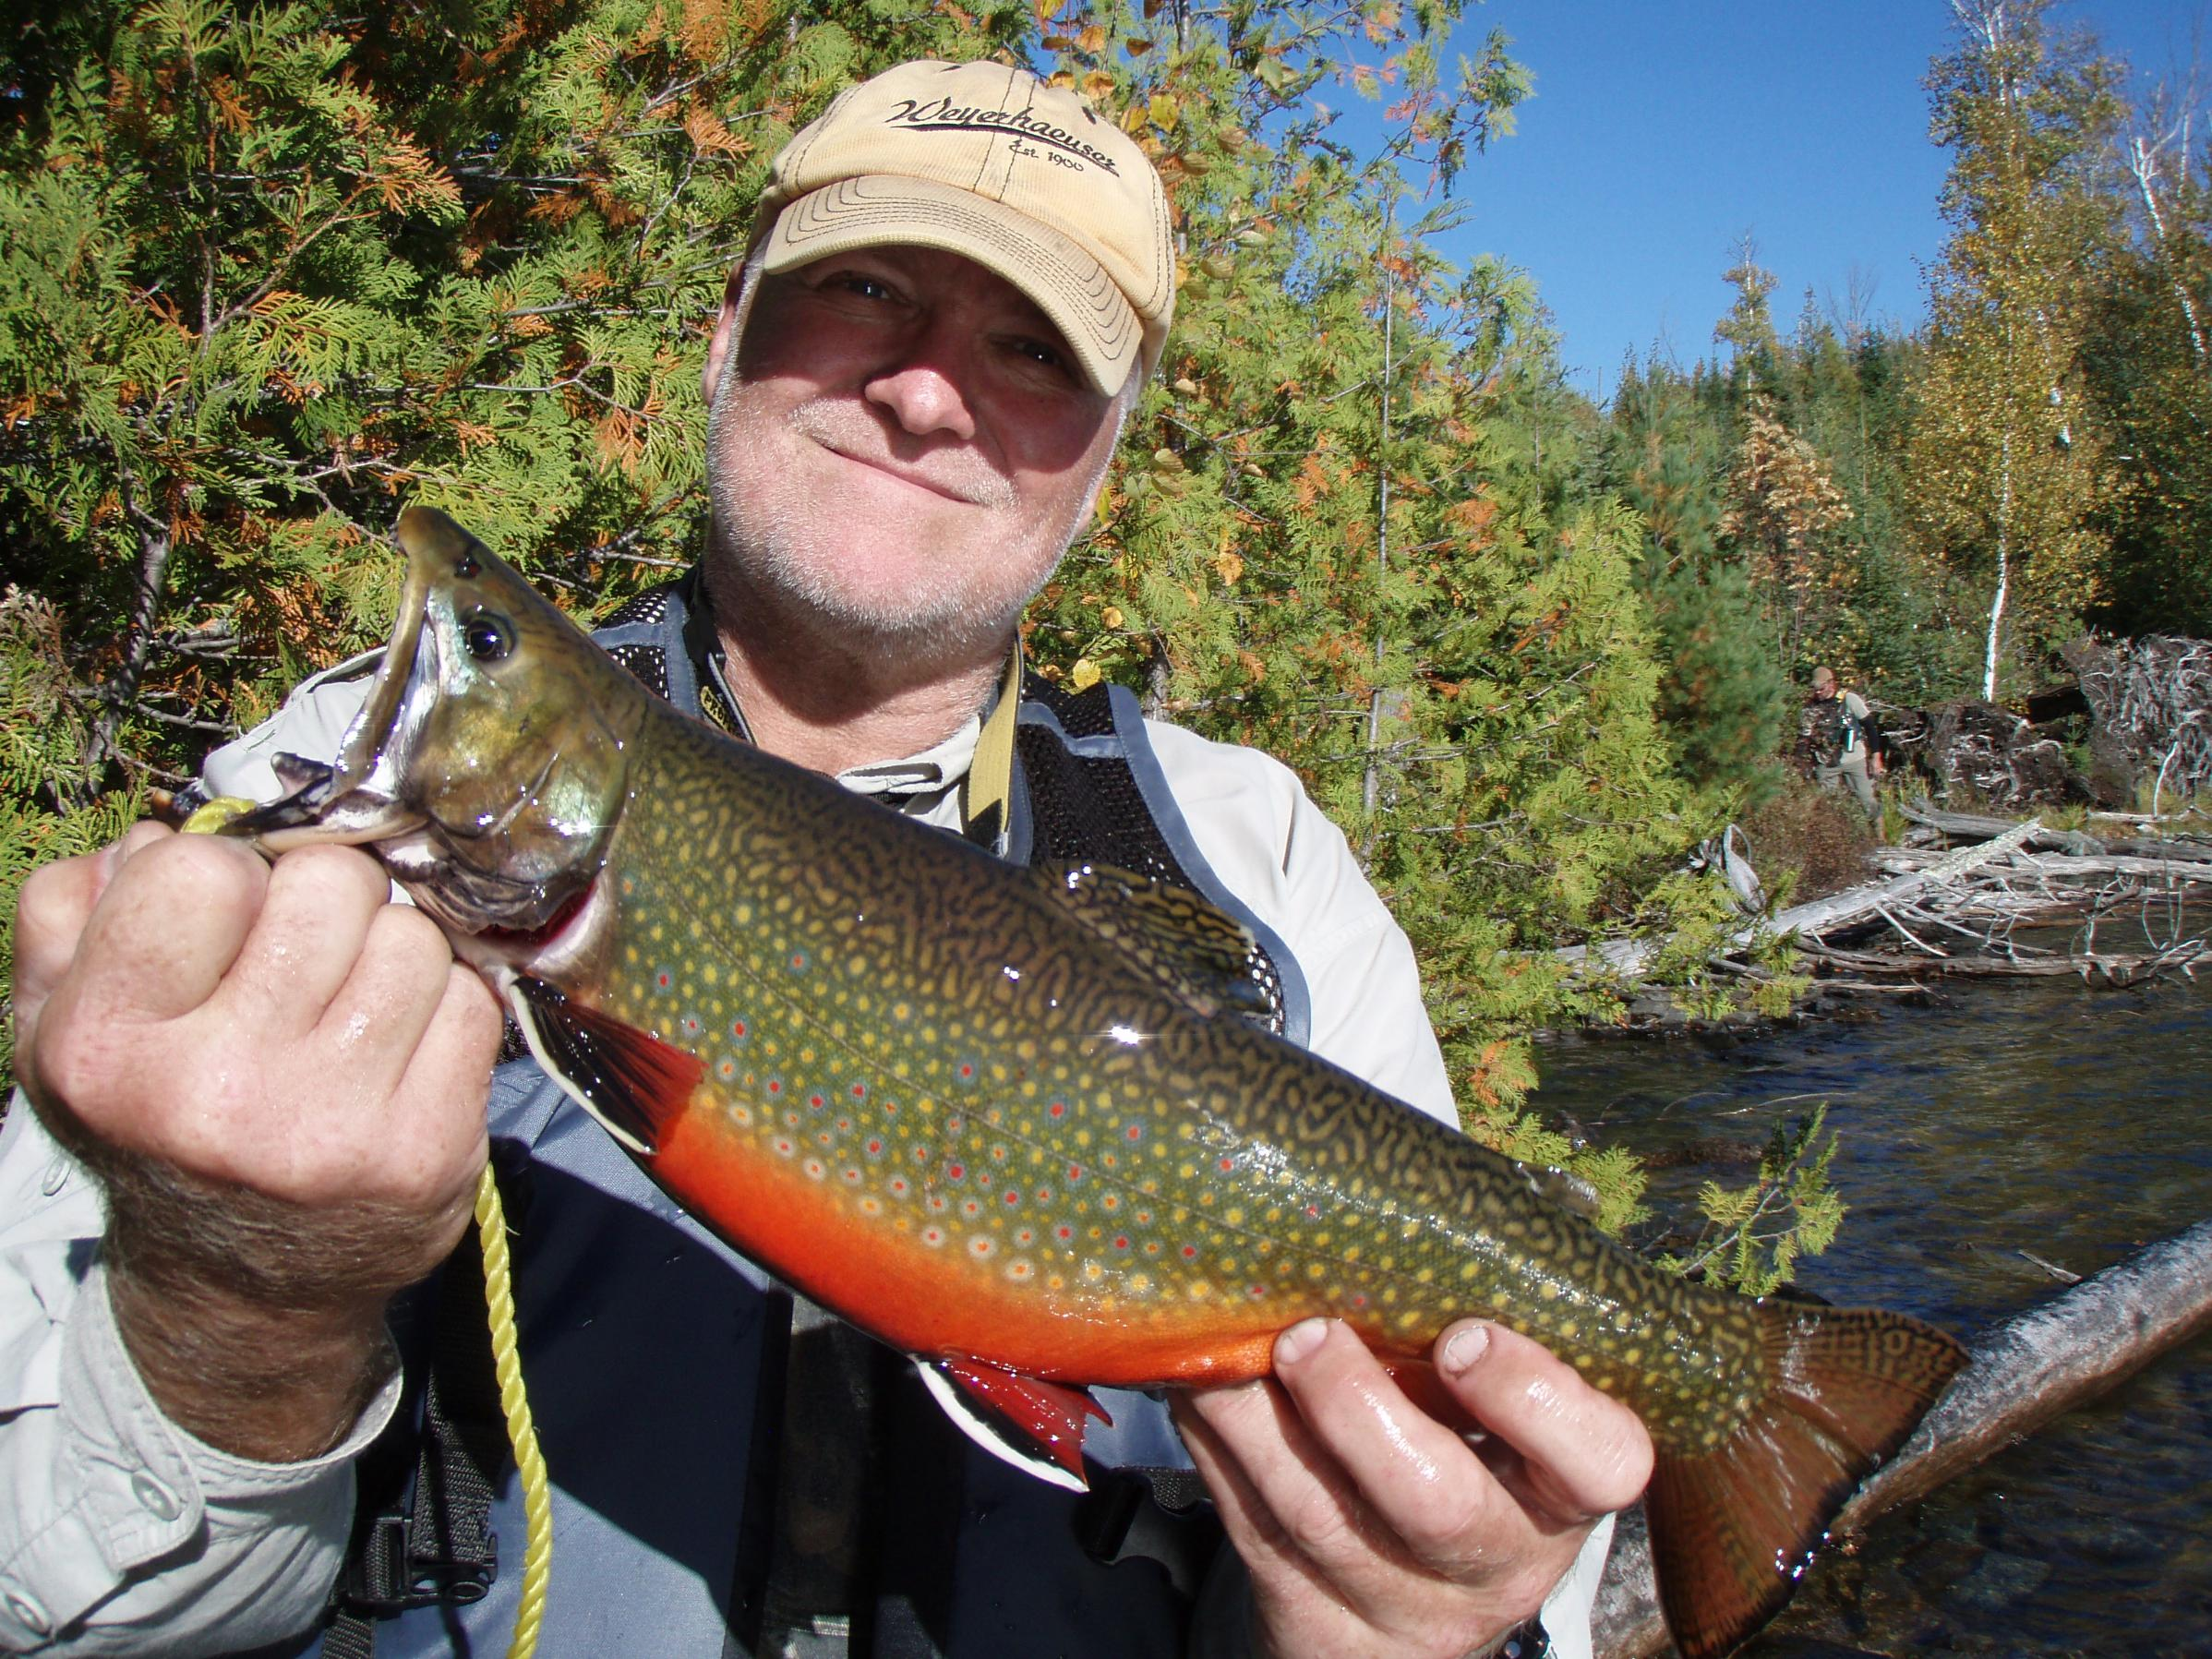 Bwca brook trout boundary waters fishing forum for Boundary waters fishing